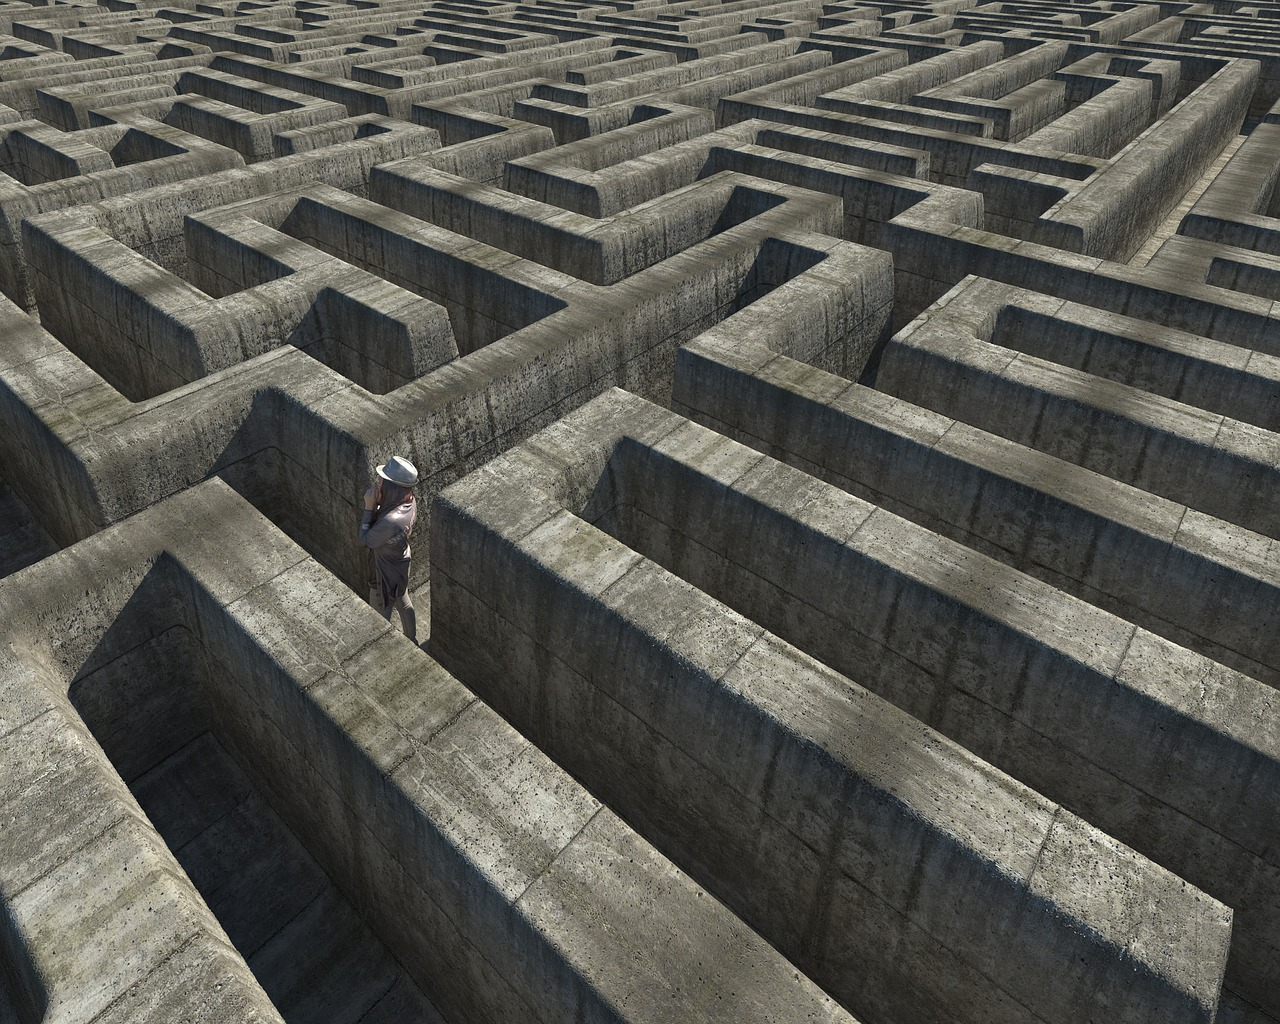 labyrinth-4300600_1280